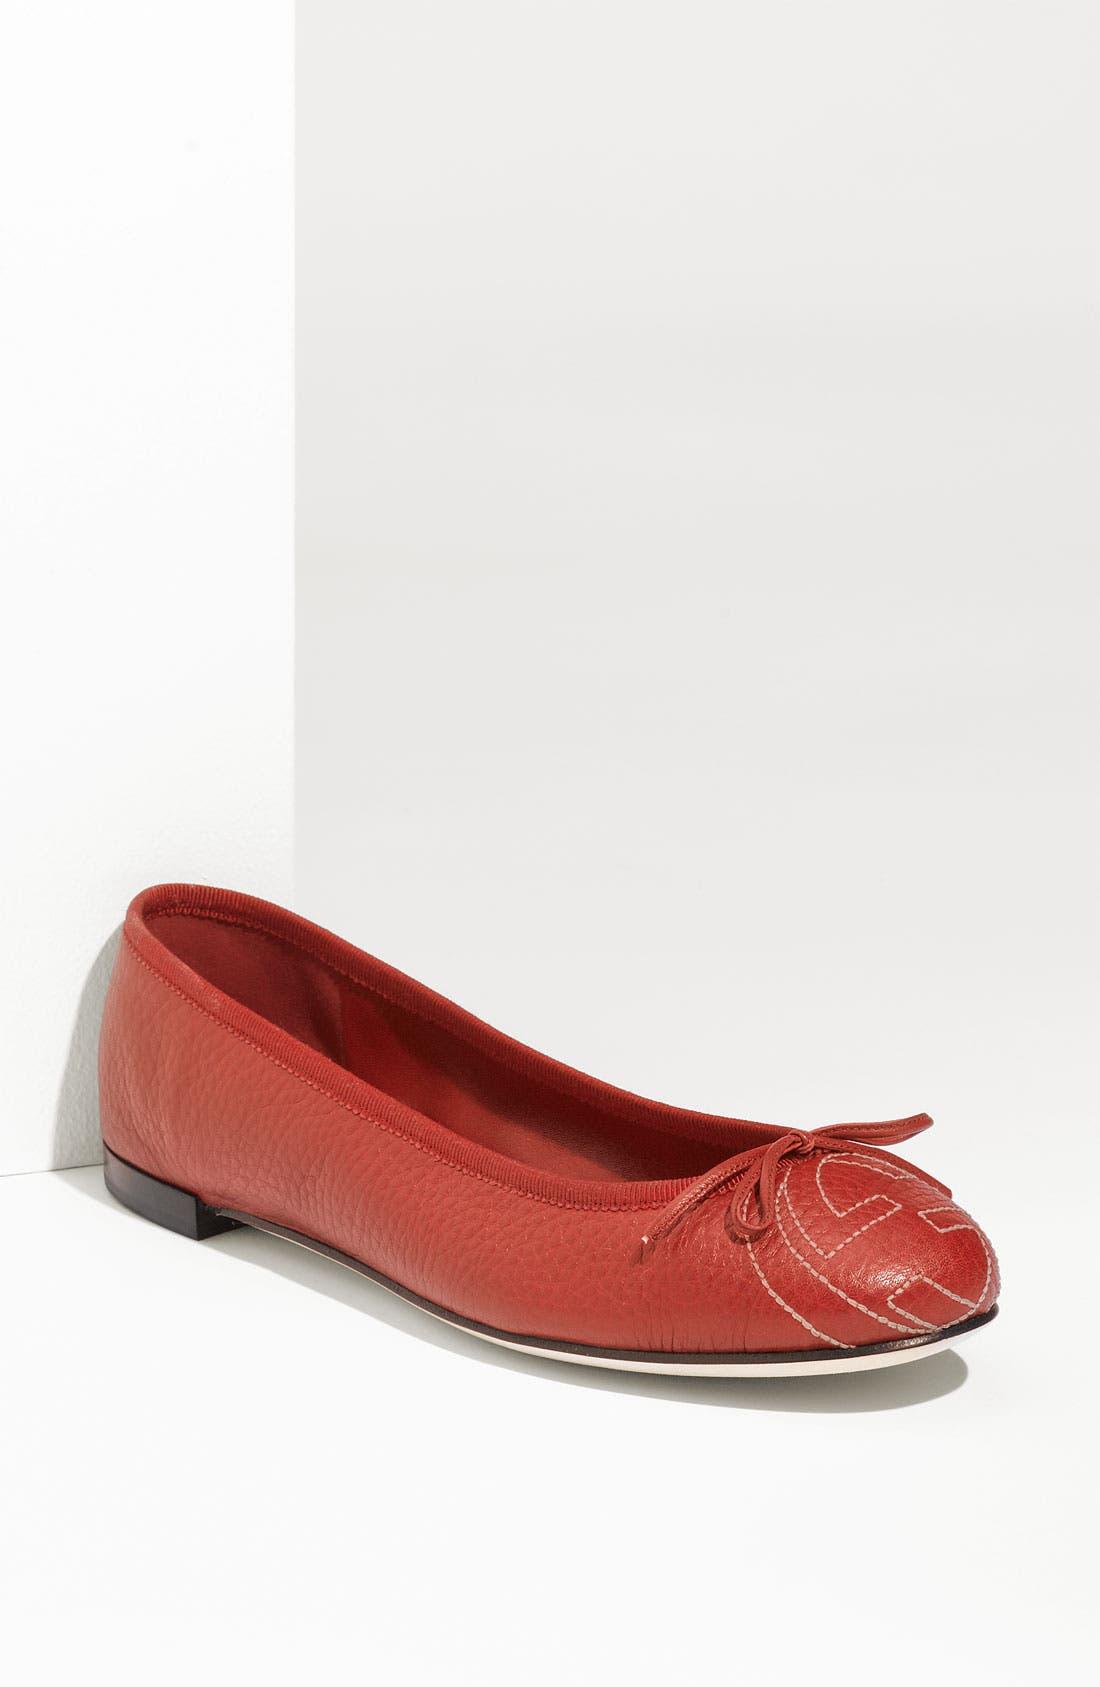 Alternate Image 1 Selected - Gucci 'Soho' Ballerina Flat